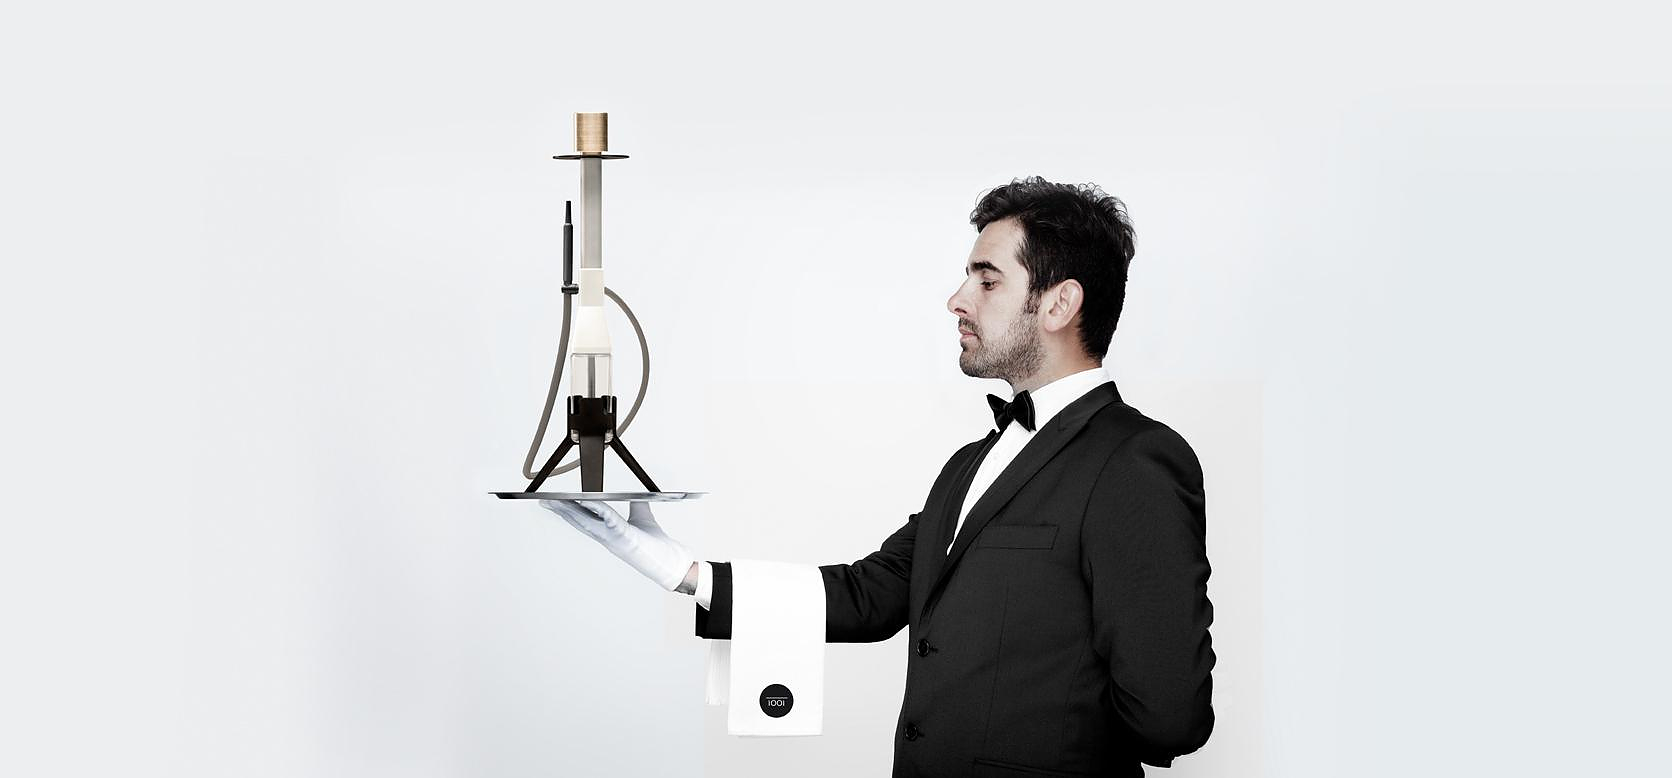 IOOI μοντέρνος ναργιλές από τον Christian Zanzotti.